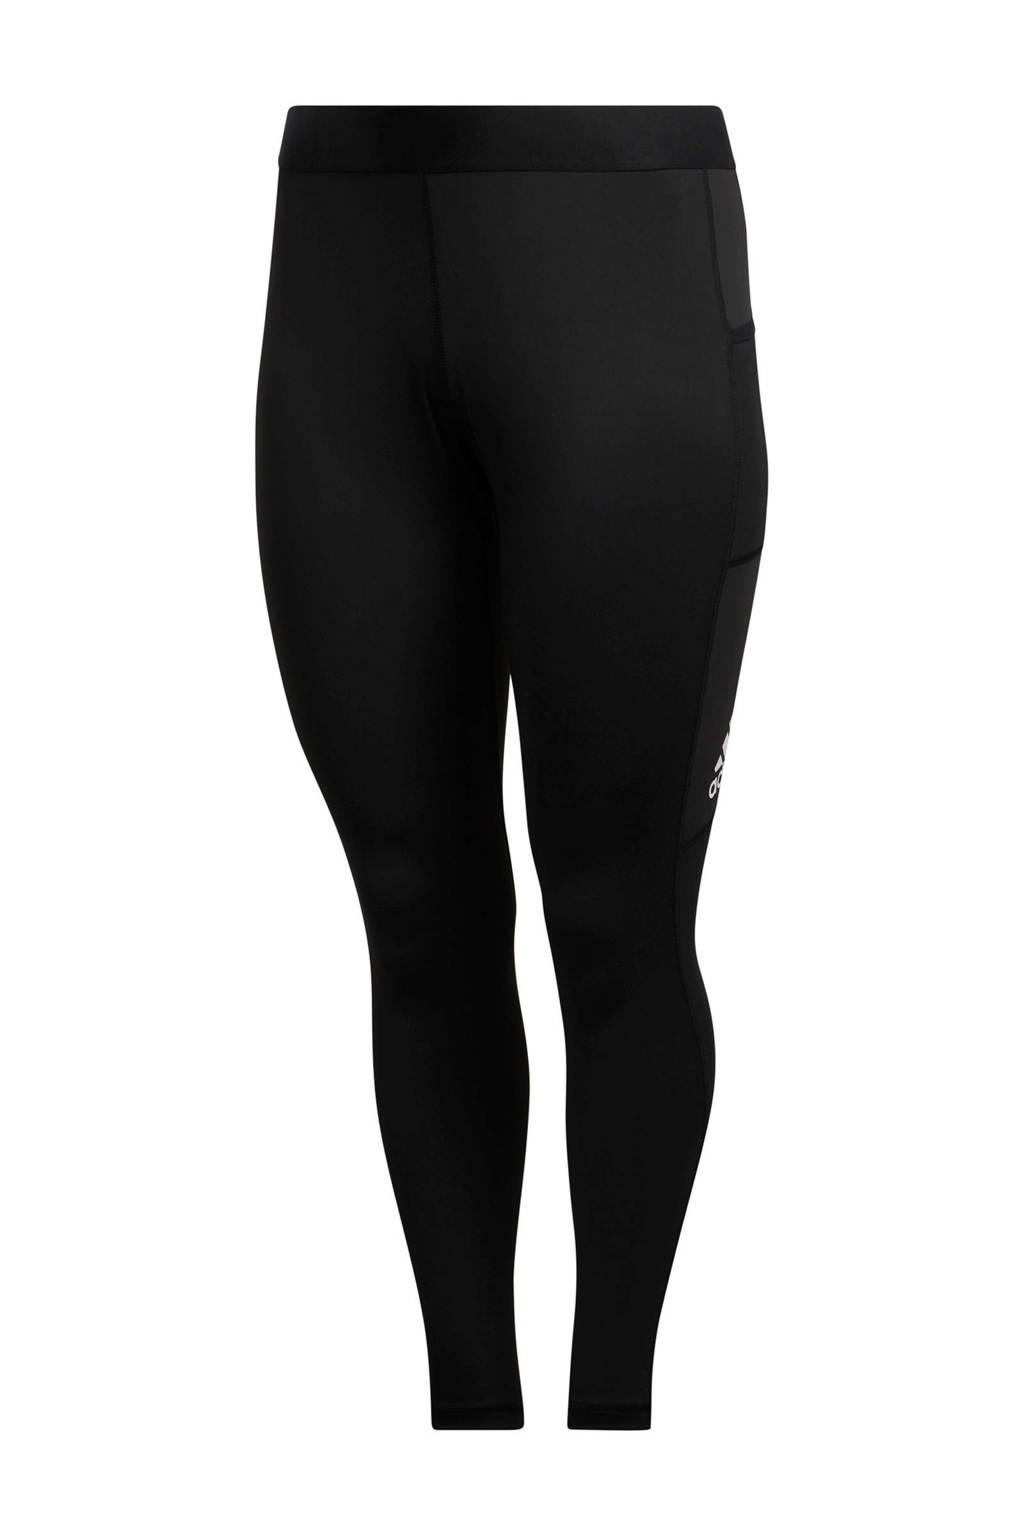 adidas Performance Plus Size sportlegging zwart, Zwart